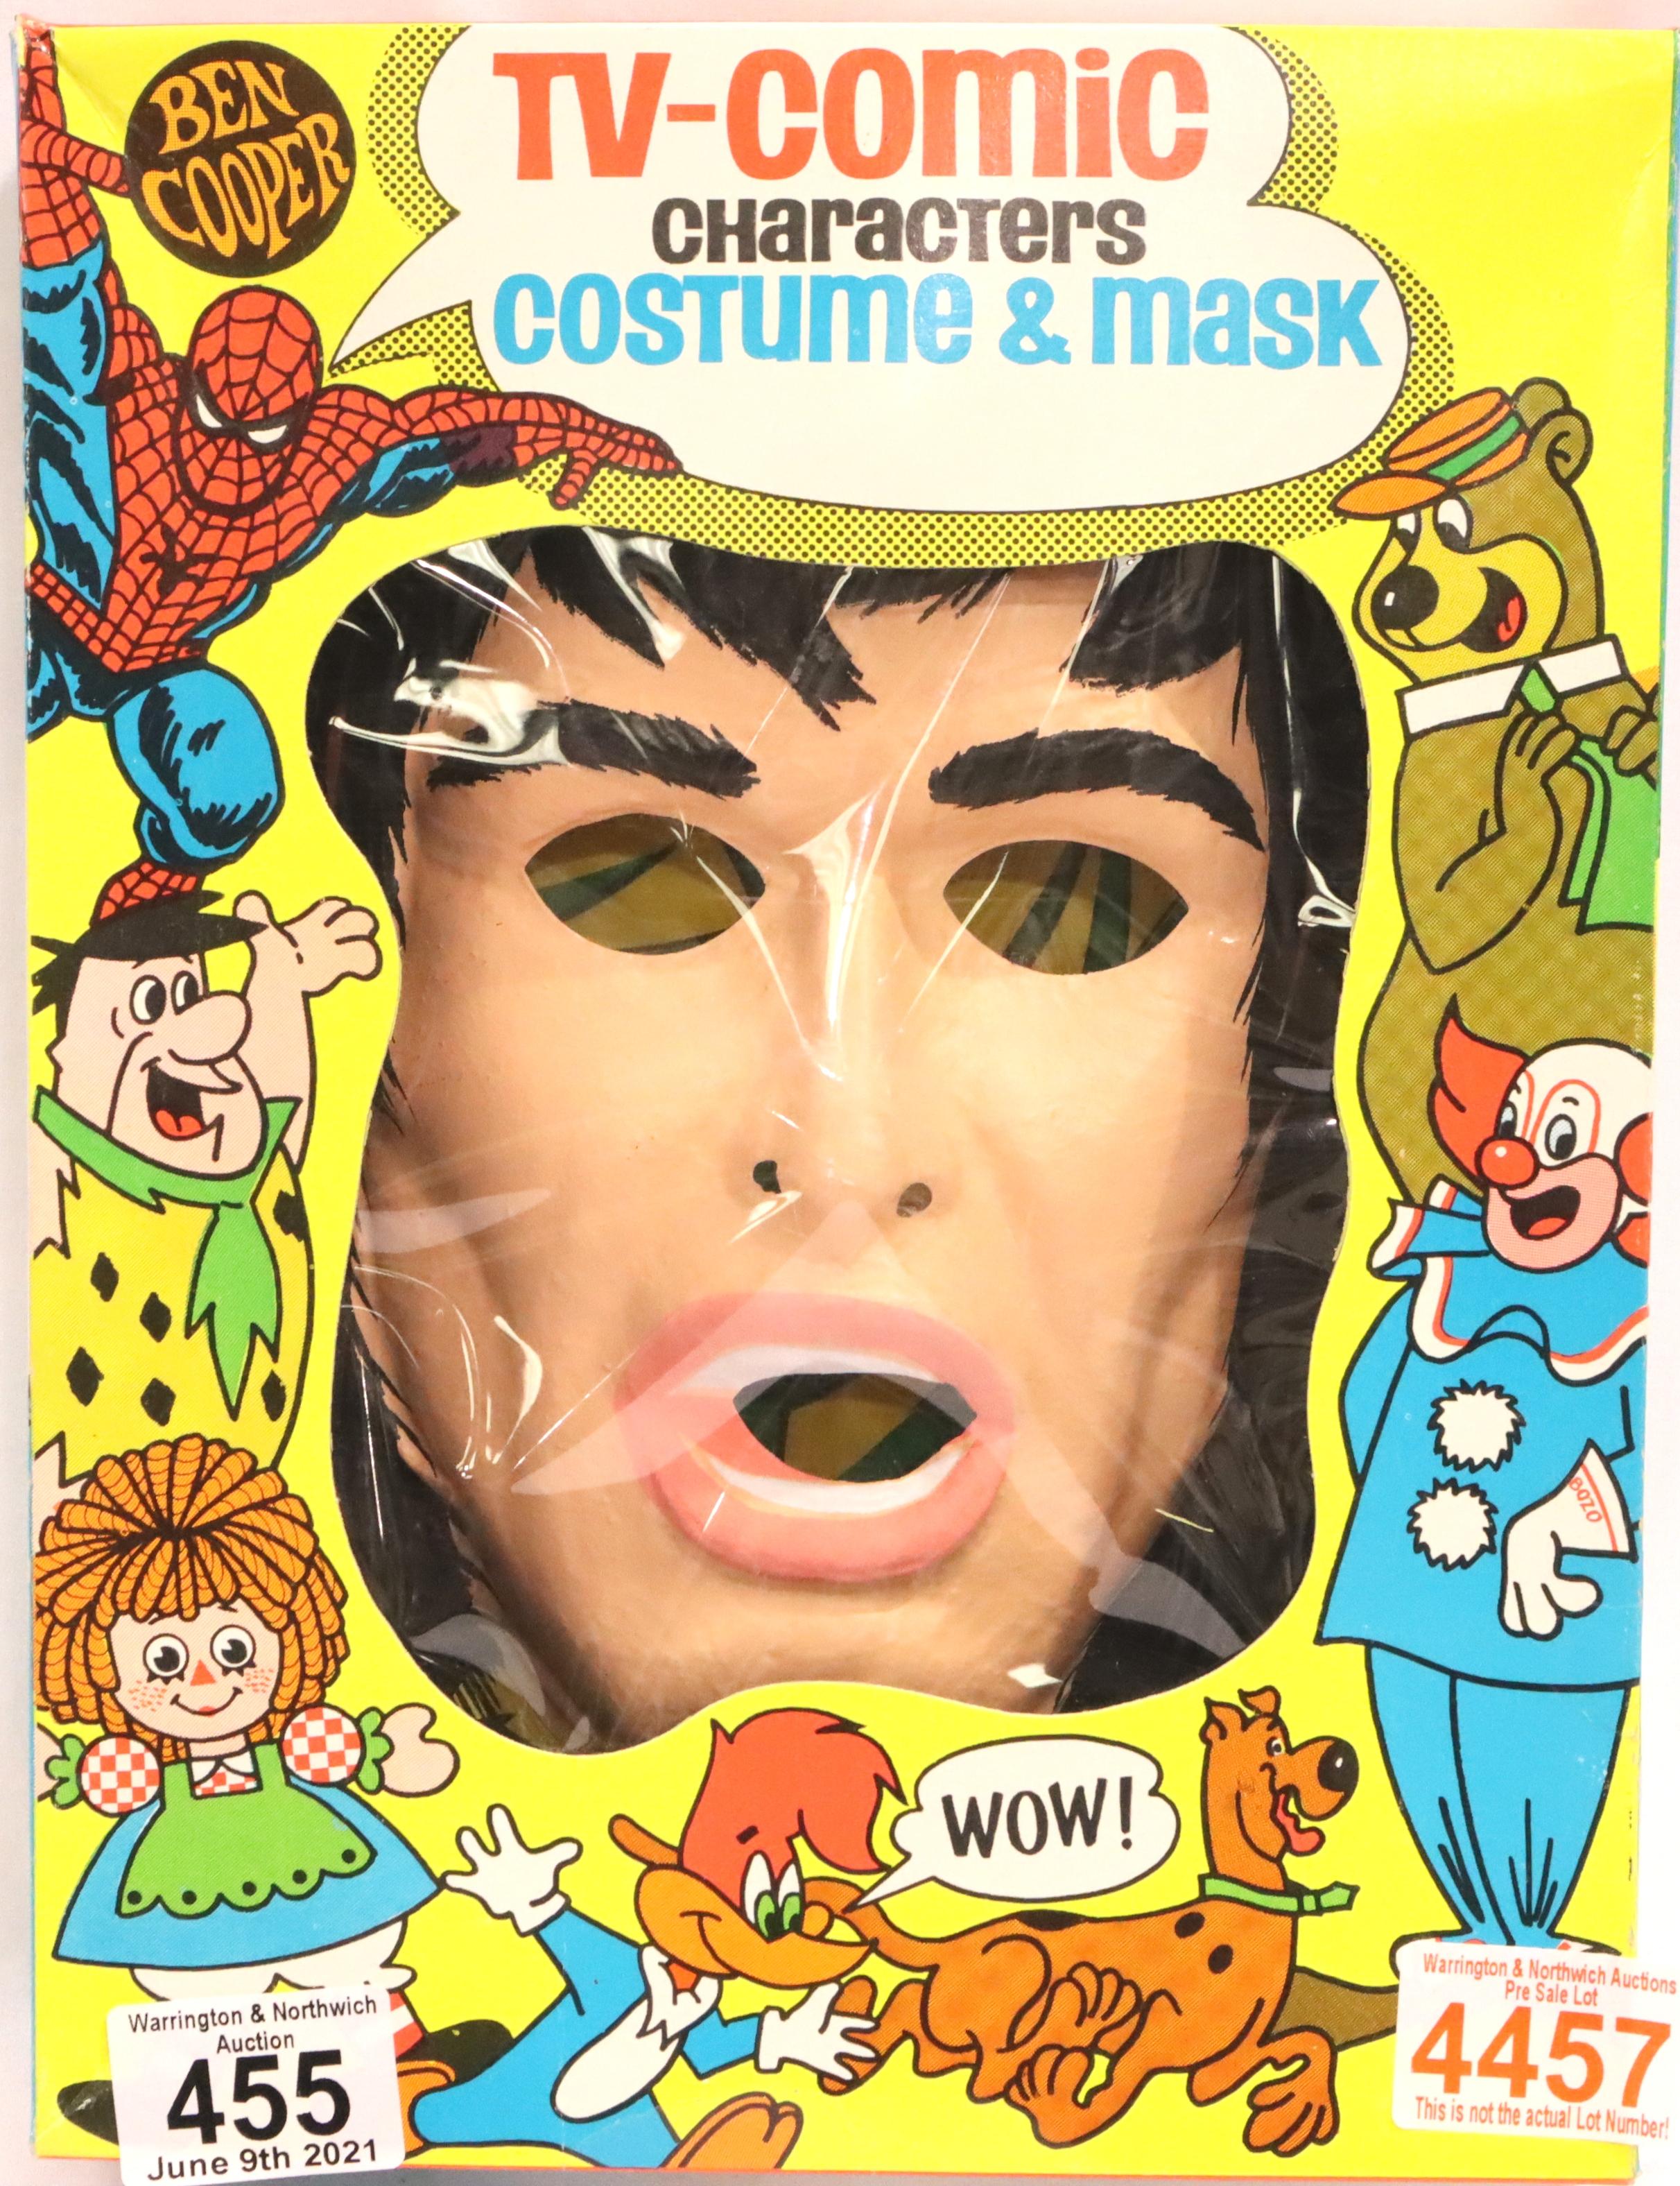 TARZAN; Ben Cooper character costume and childrens halloween mask of Ron Ely TVs first Tarzan c1966.